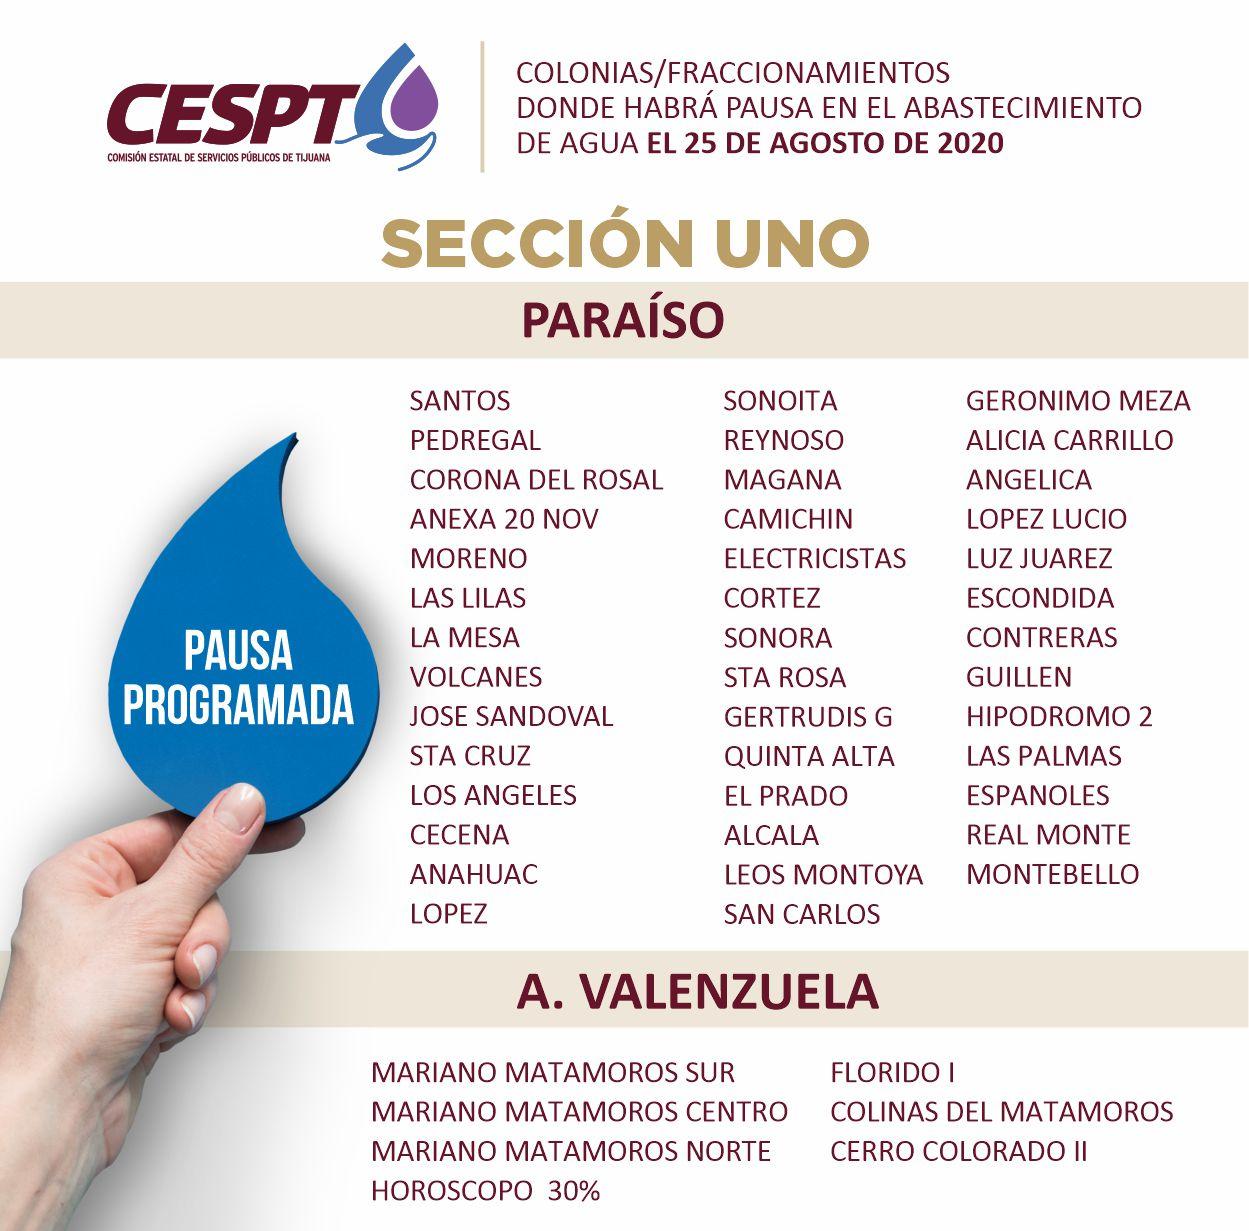 CESPT anuncia segunda lista de colonias Sección 1